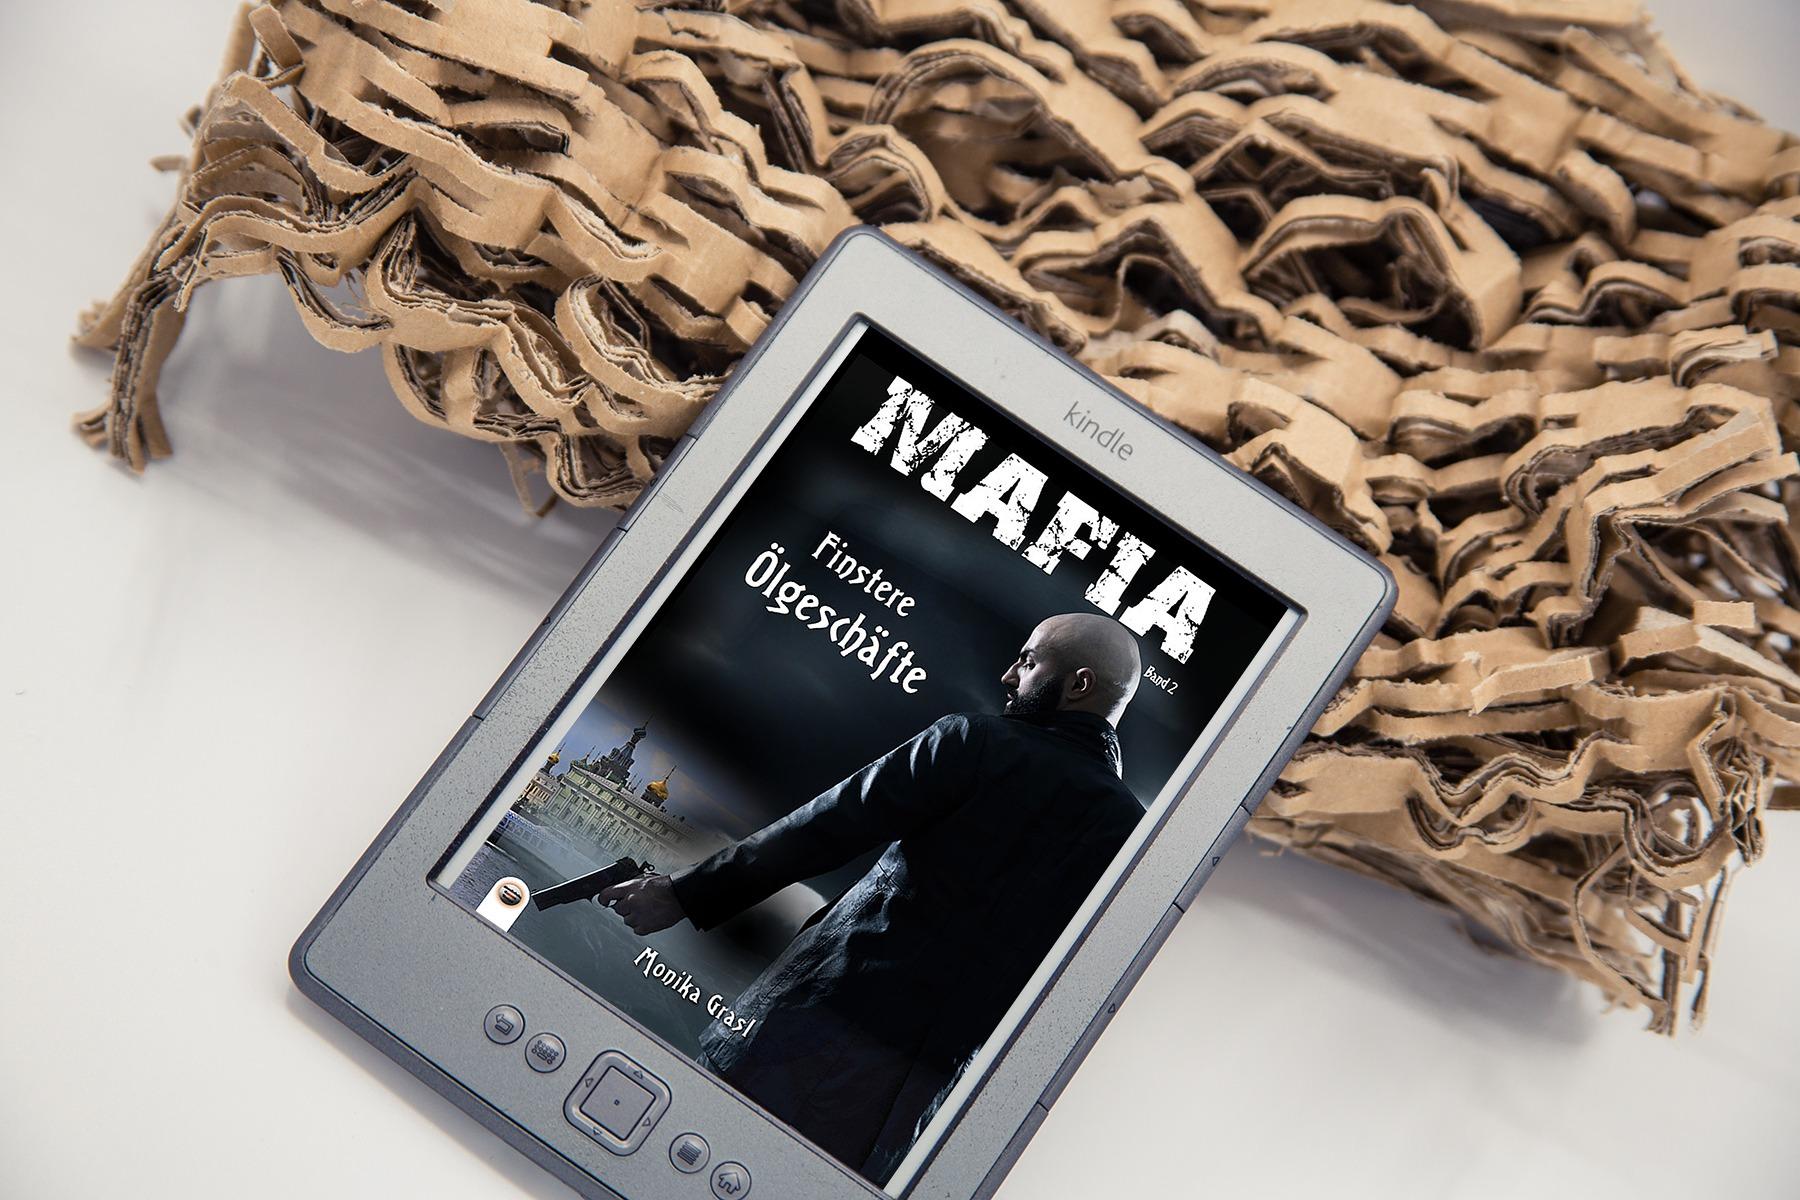 Finstere Ölgeschäfte: Mafia - Monika Grasl